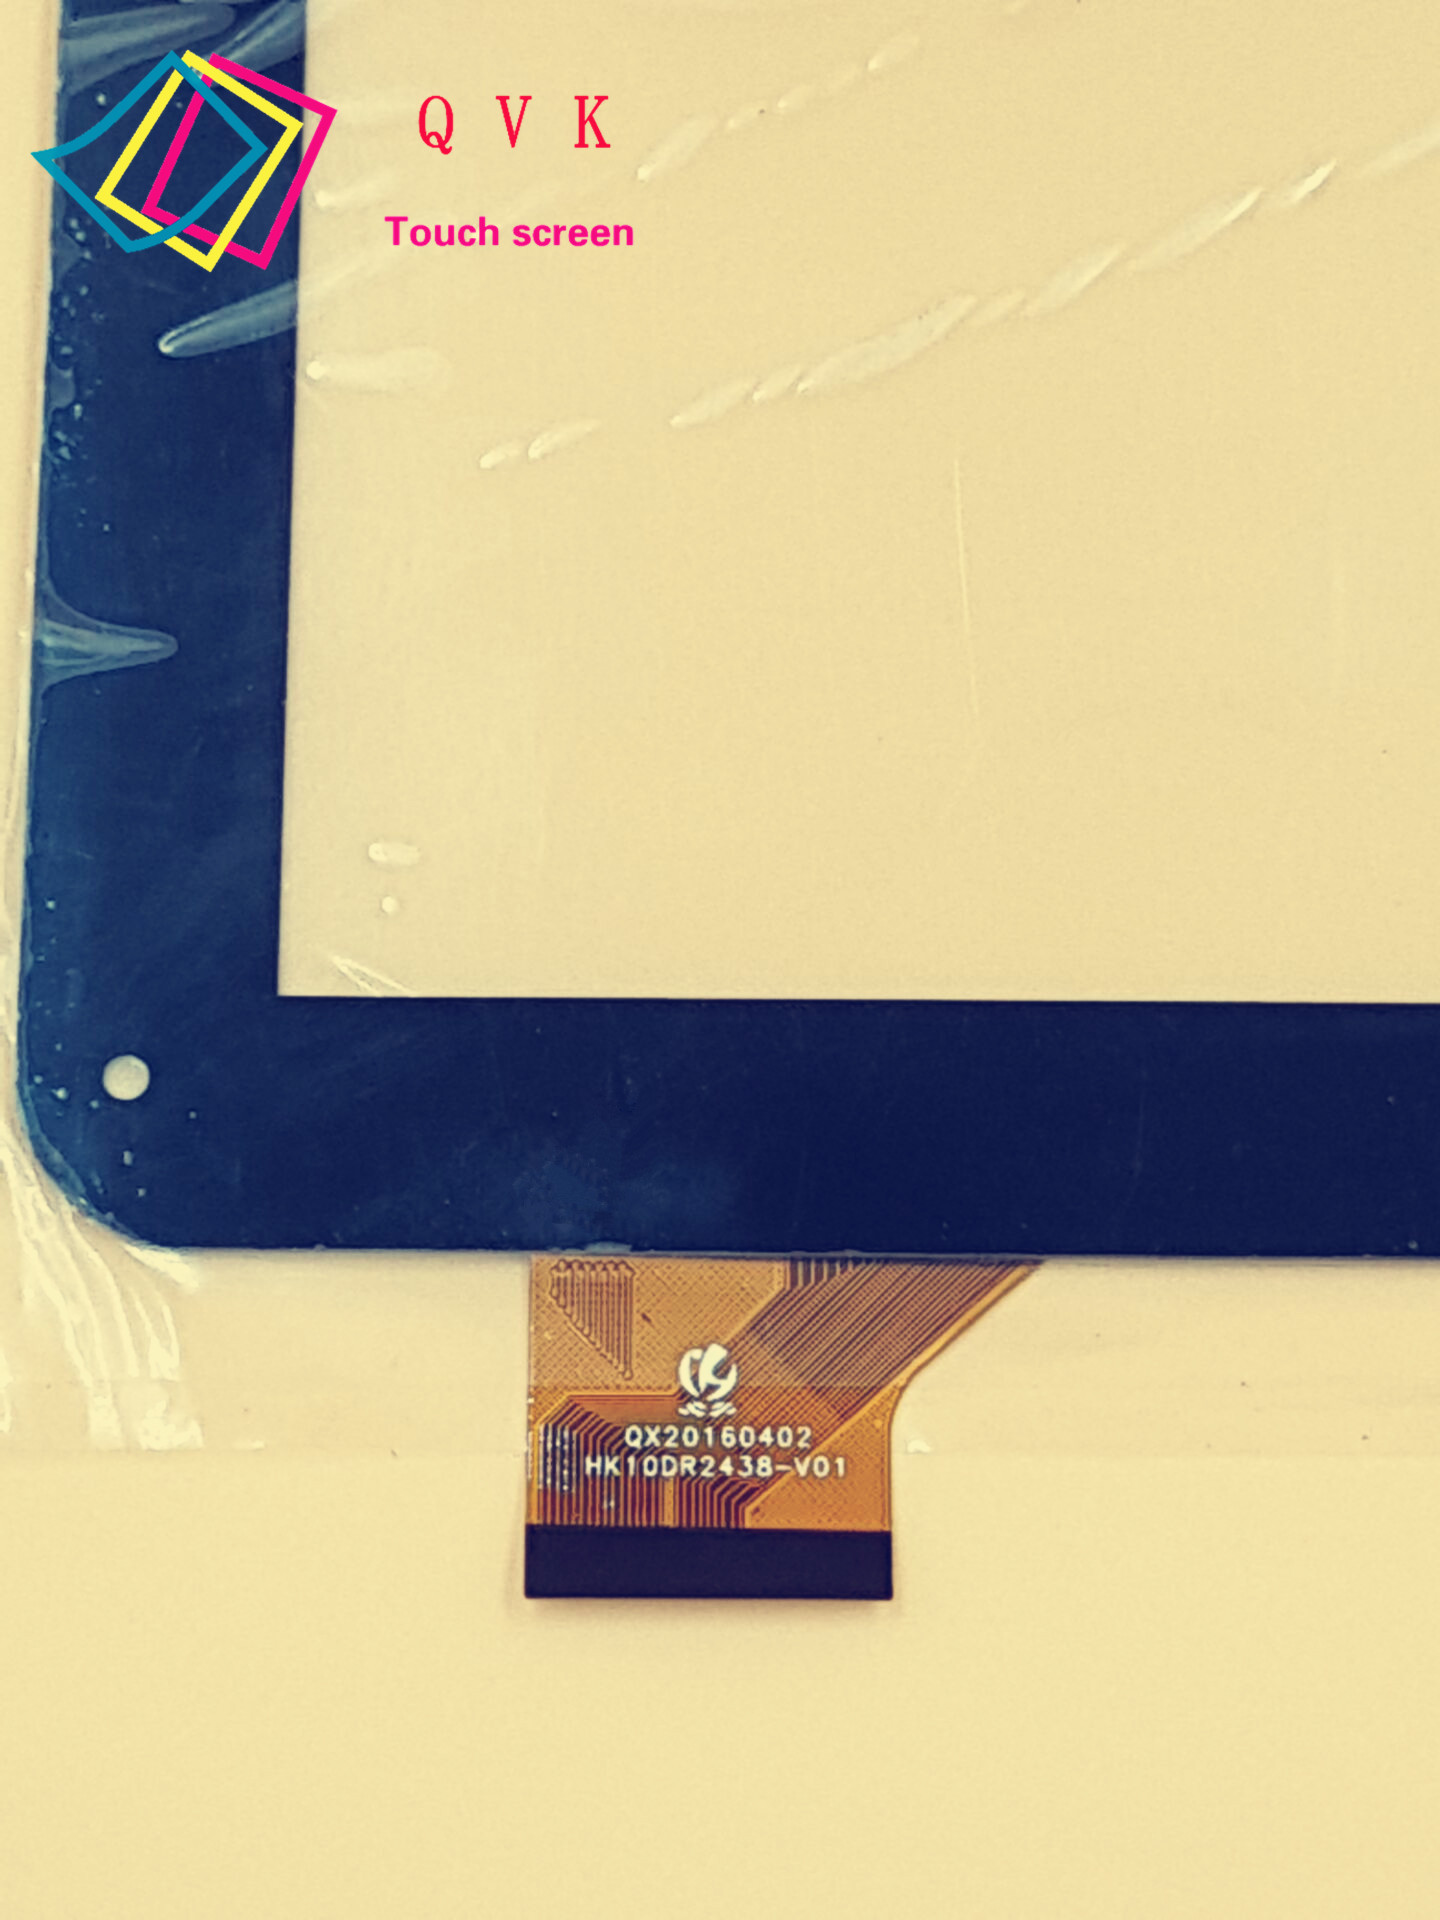 black white 10.1inch HK10DR2438  HK10DR2438-V01 external capacitive Touch screen capacitance panel For Wolder tablet pc 10 1inch ycf0464 ycf0464 a for oysters t12 t12d t12v 3g tablet pc a external capacitive touch screen capacitance panel